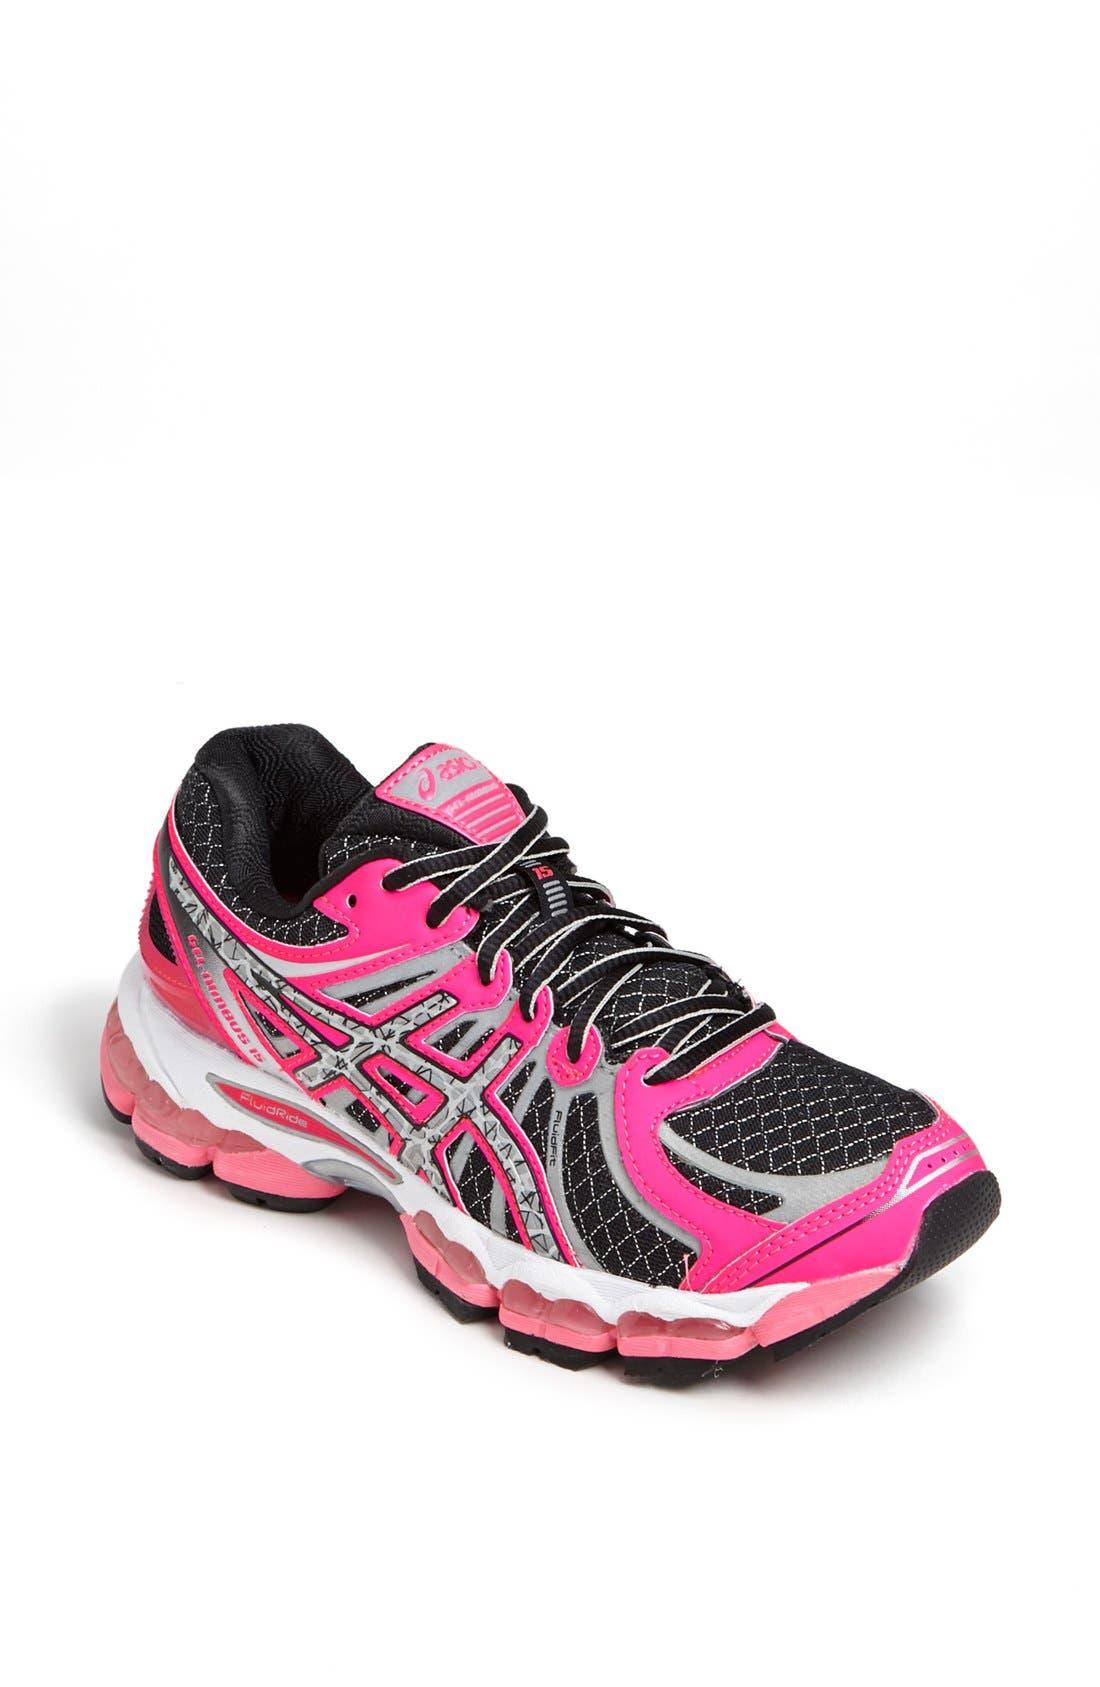 Alternate Image 1 Selected - Asics® 'GEL-Nimbus® 15 Lite' Running Shoe (Women)